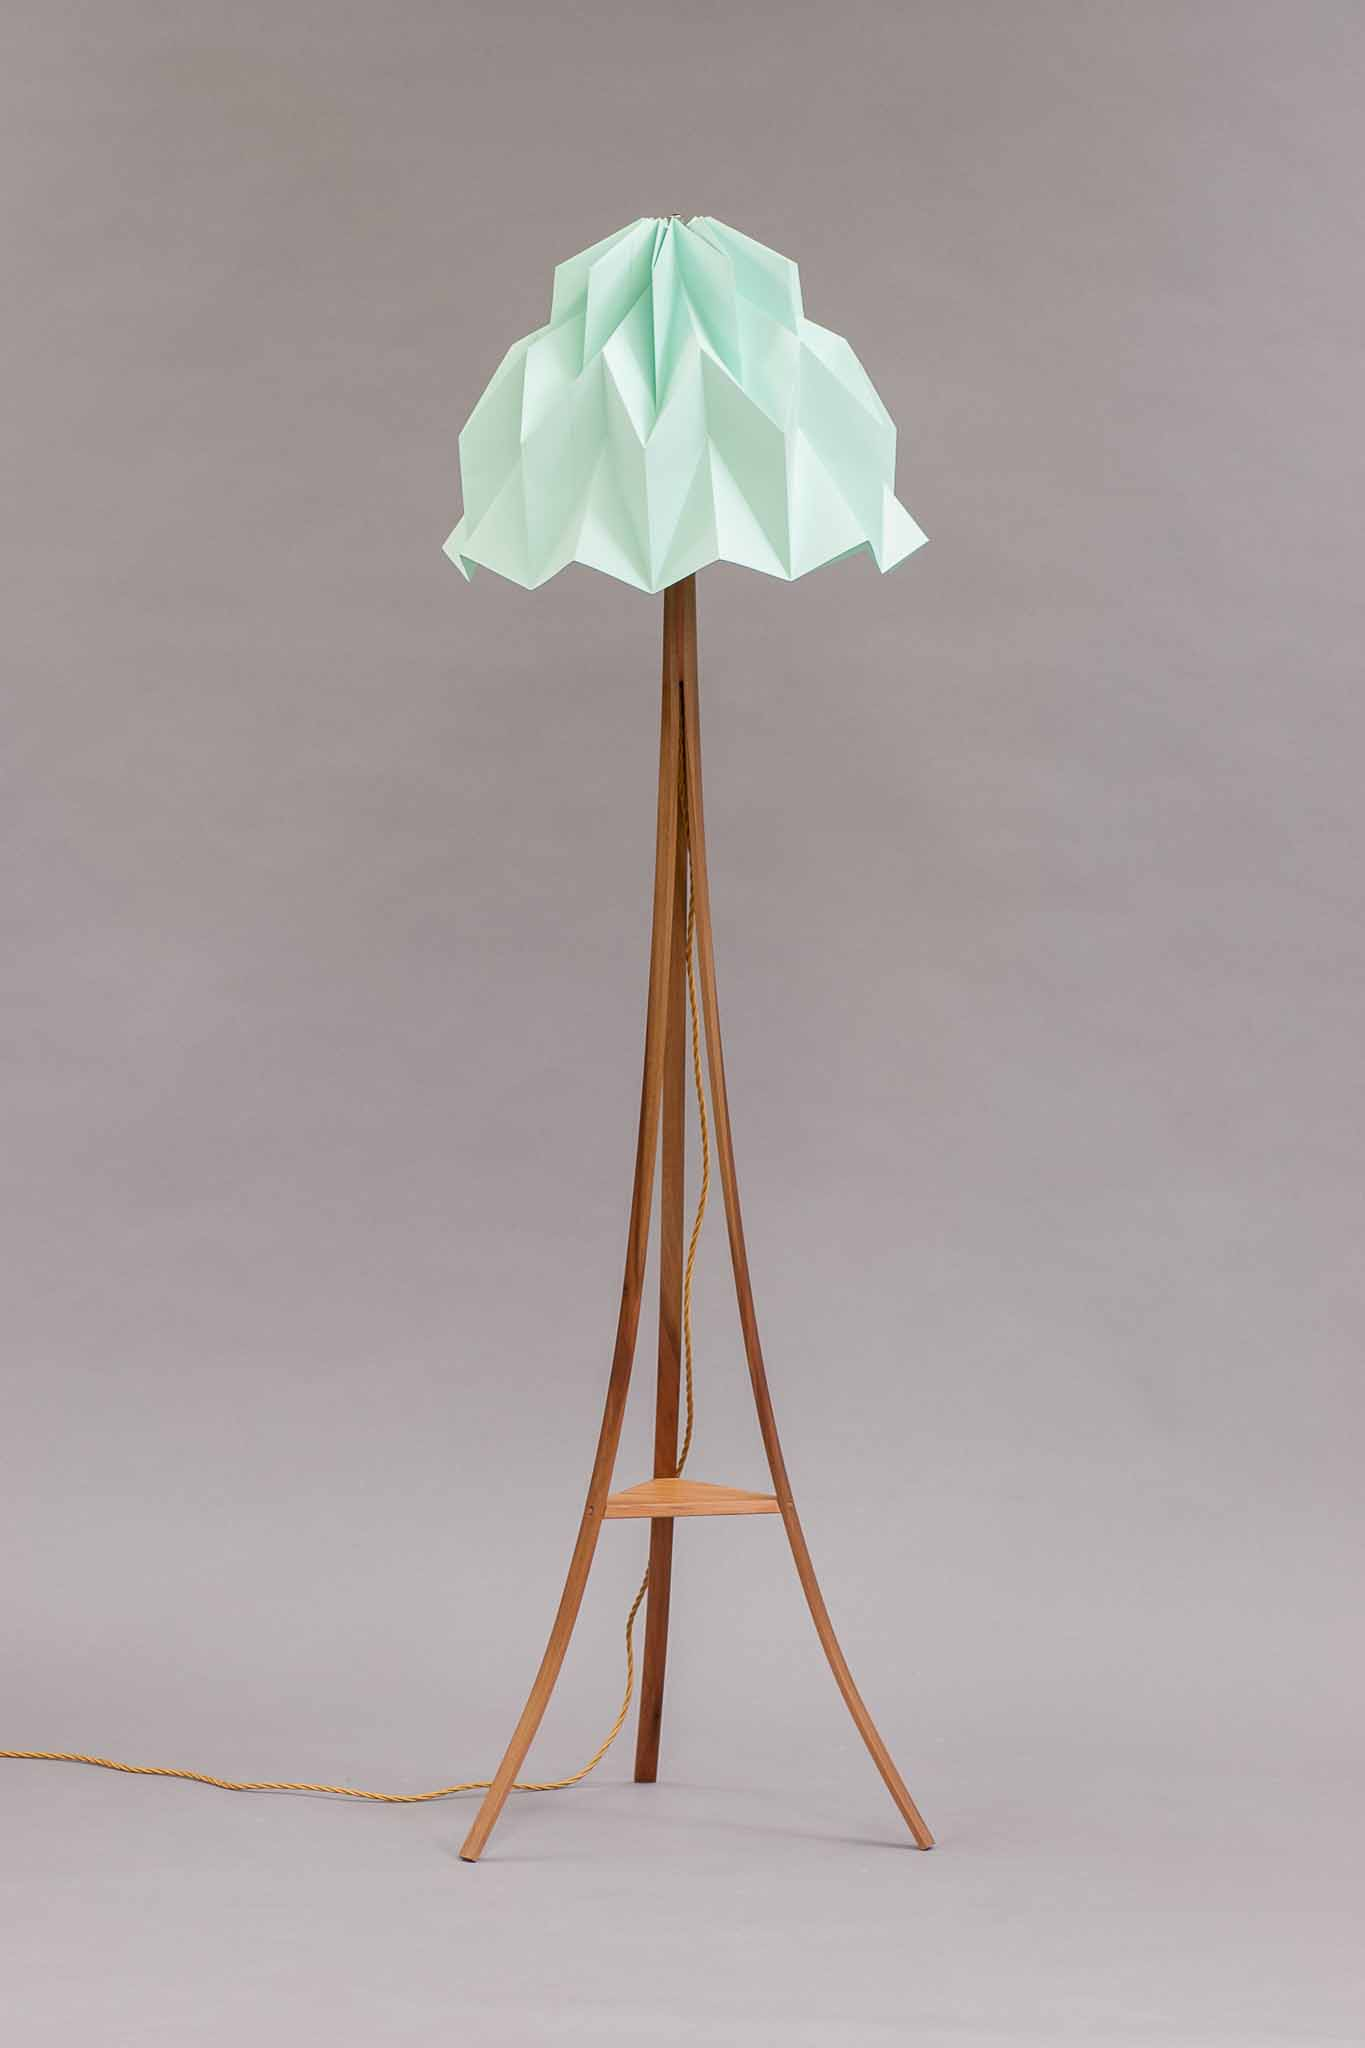 kpln_lamp-1